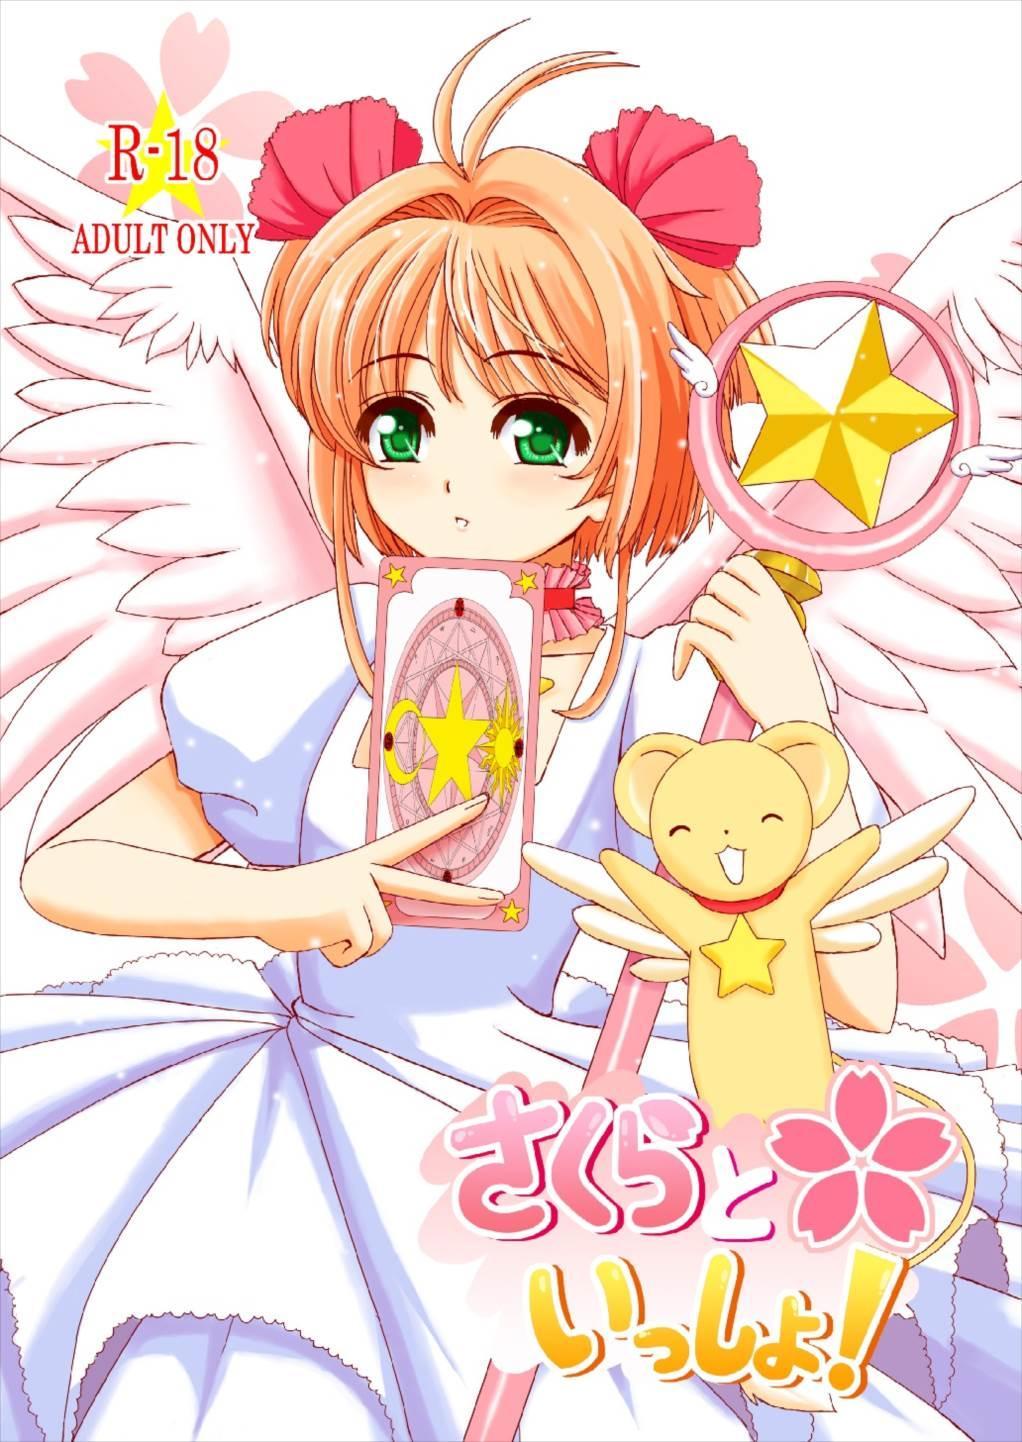 Sakura to Issho! 33